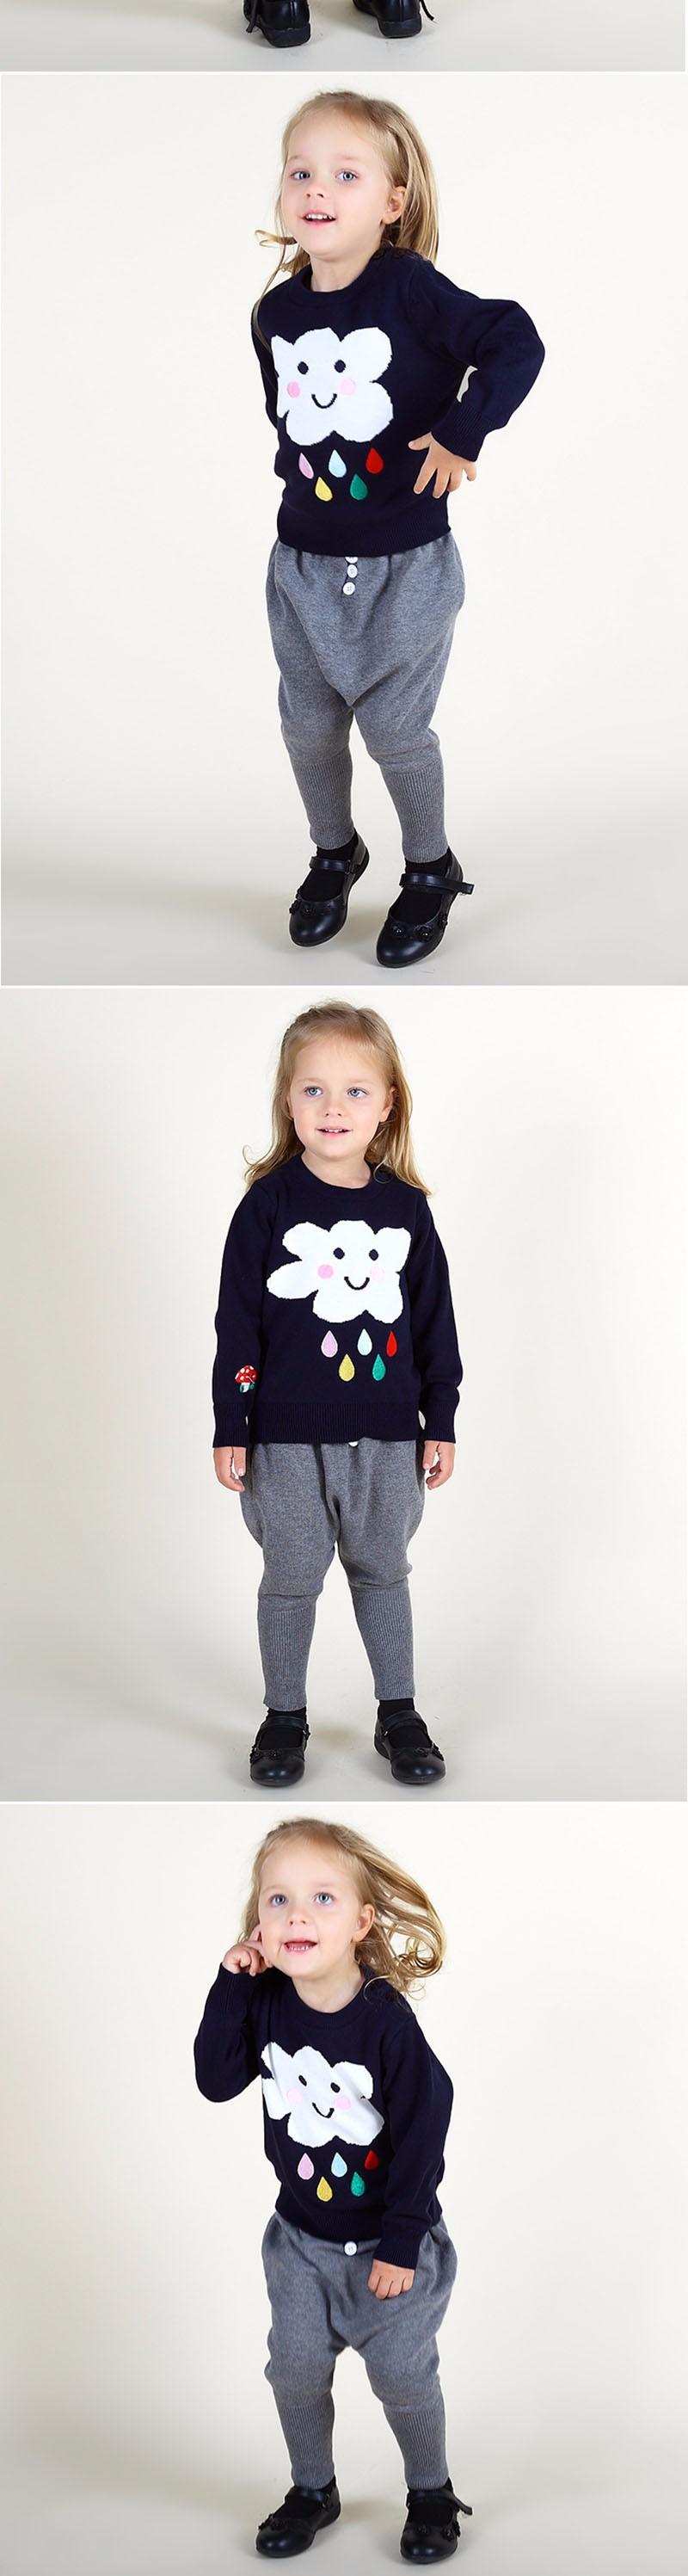 sweater08